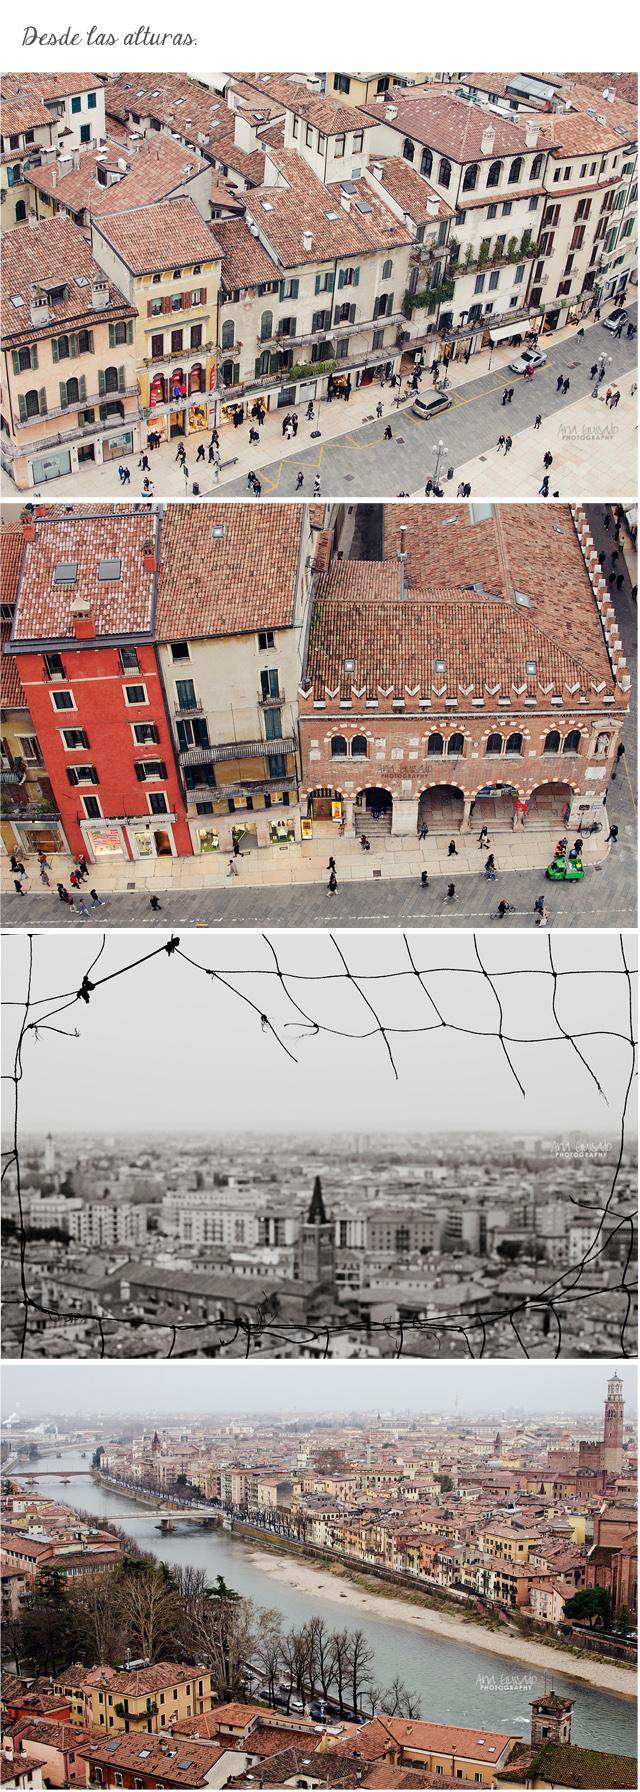 20130323_Verona_3